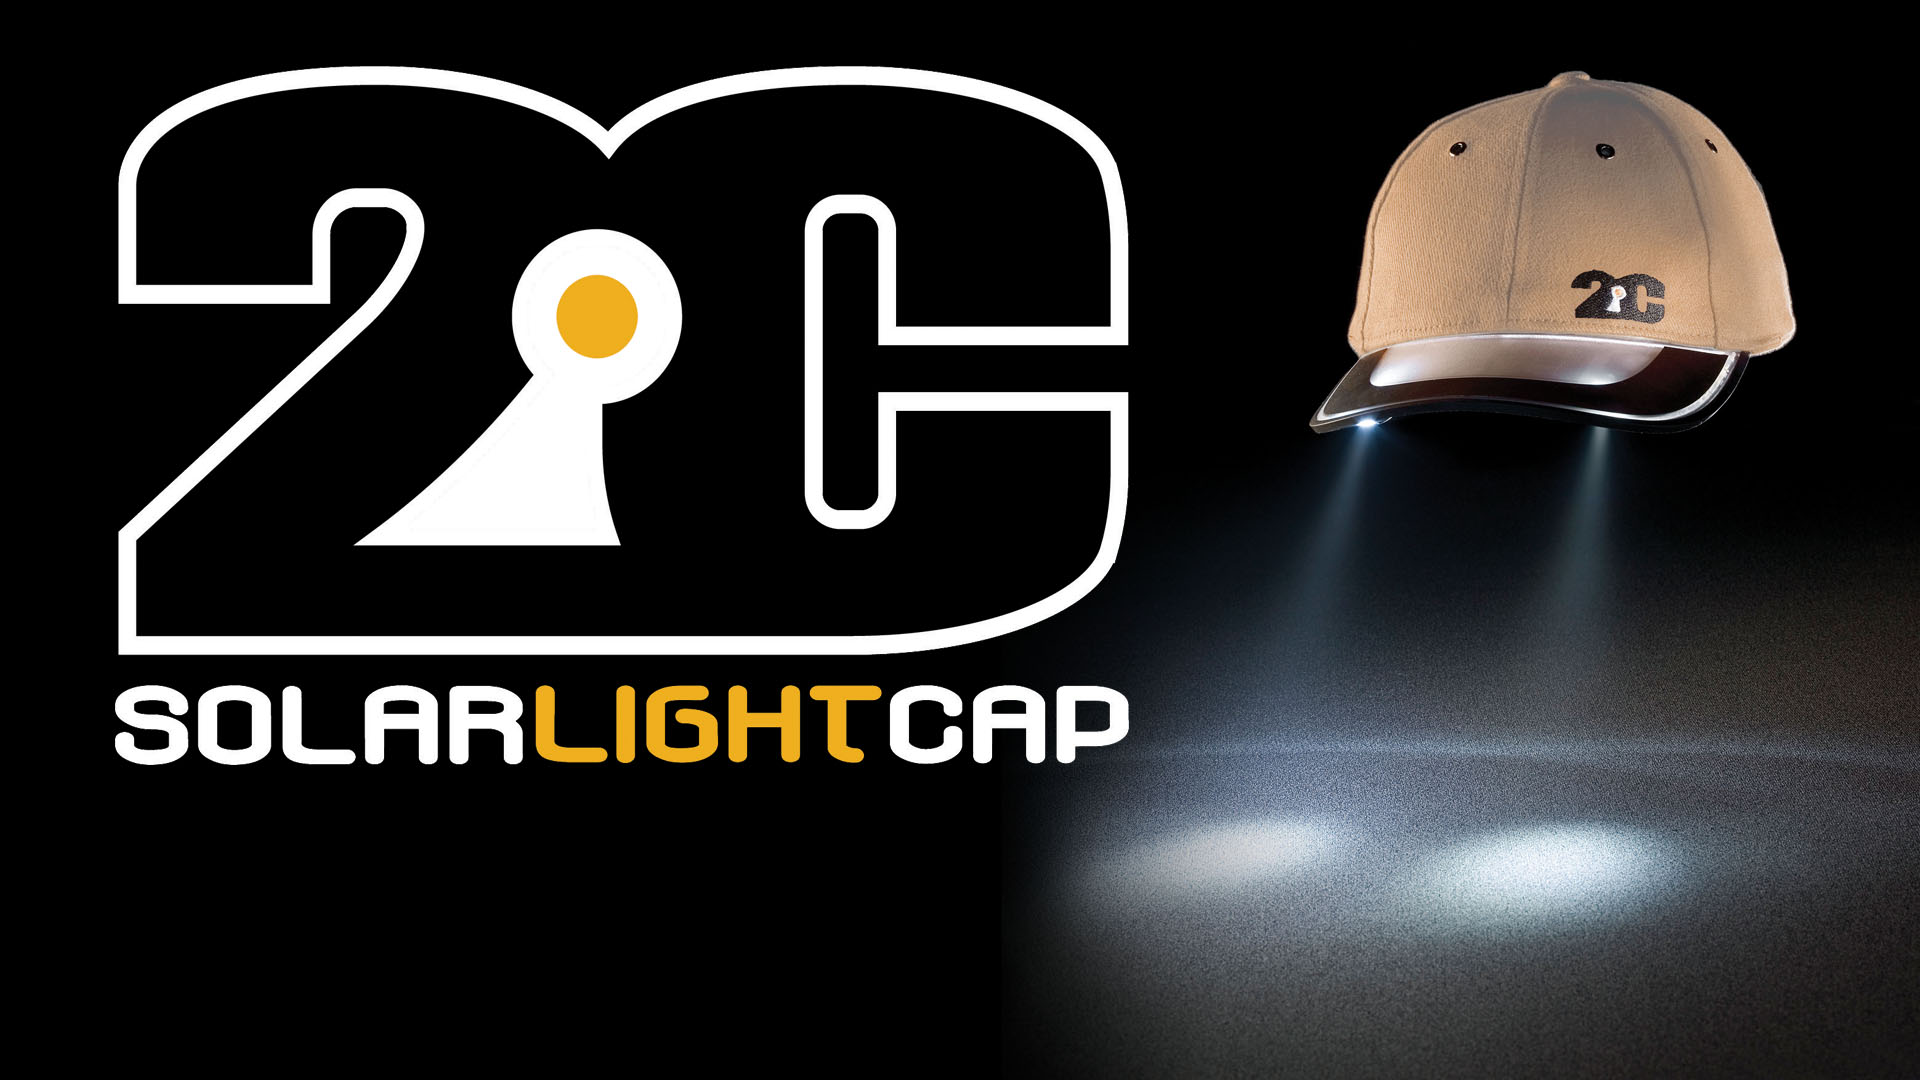 2C Solar Light cap - self charging wearable flashlight